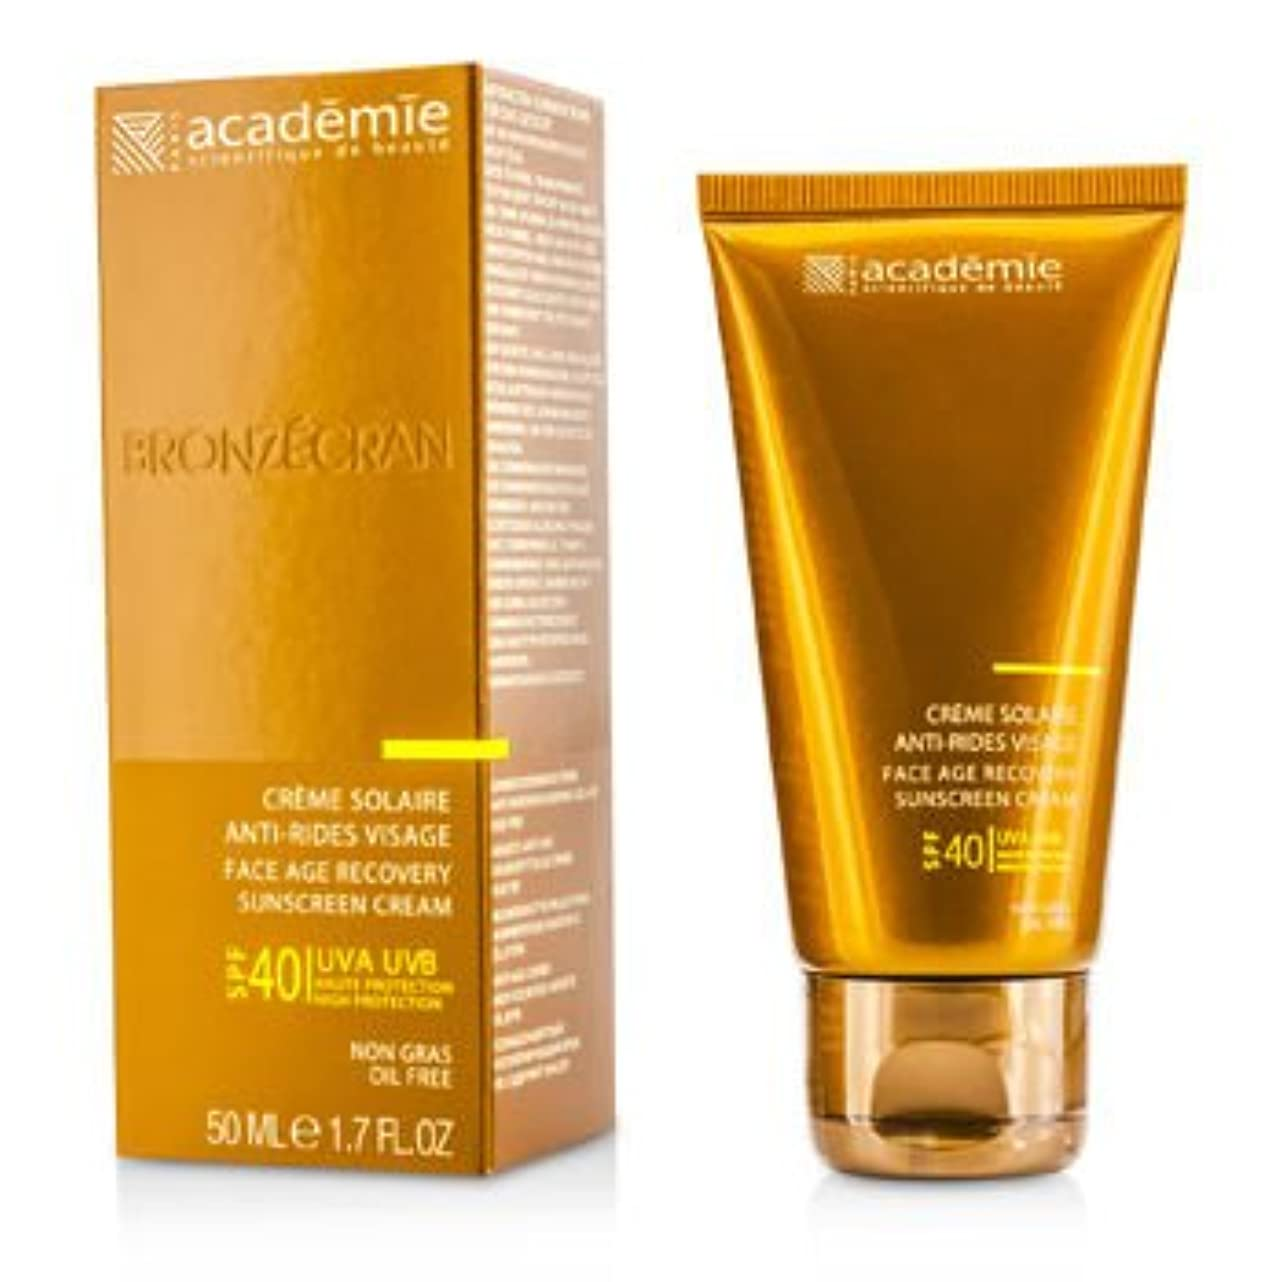 繁雑写真画像[Academie] Scientific System Face Age Recovery Sunscreen Cream SPF40 50ml/1.7oz